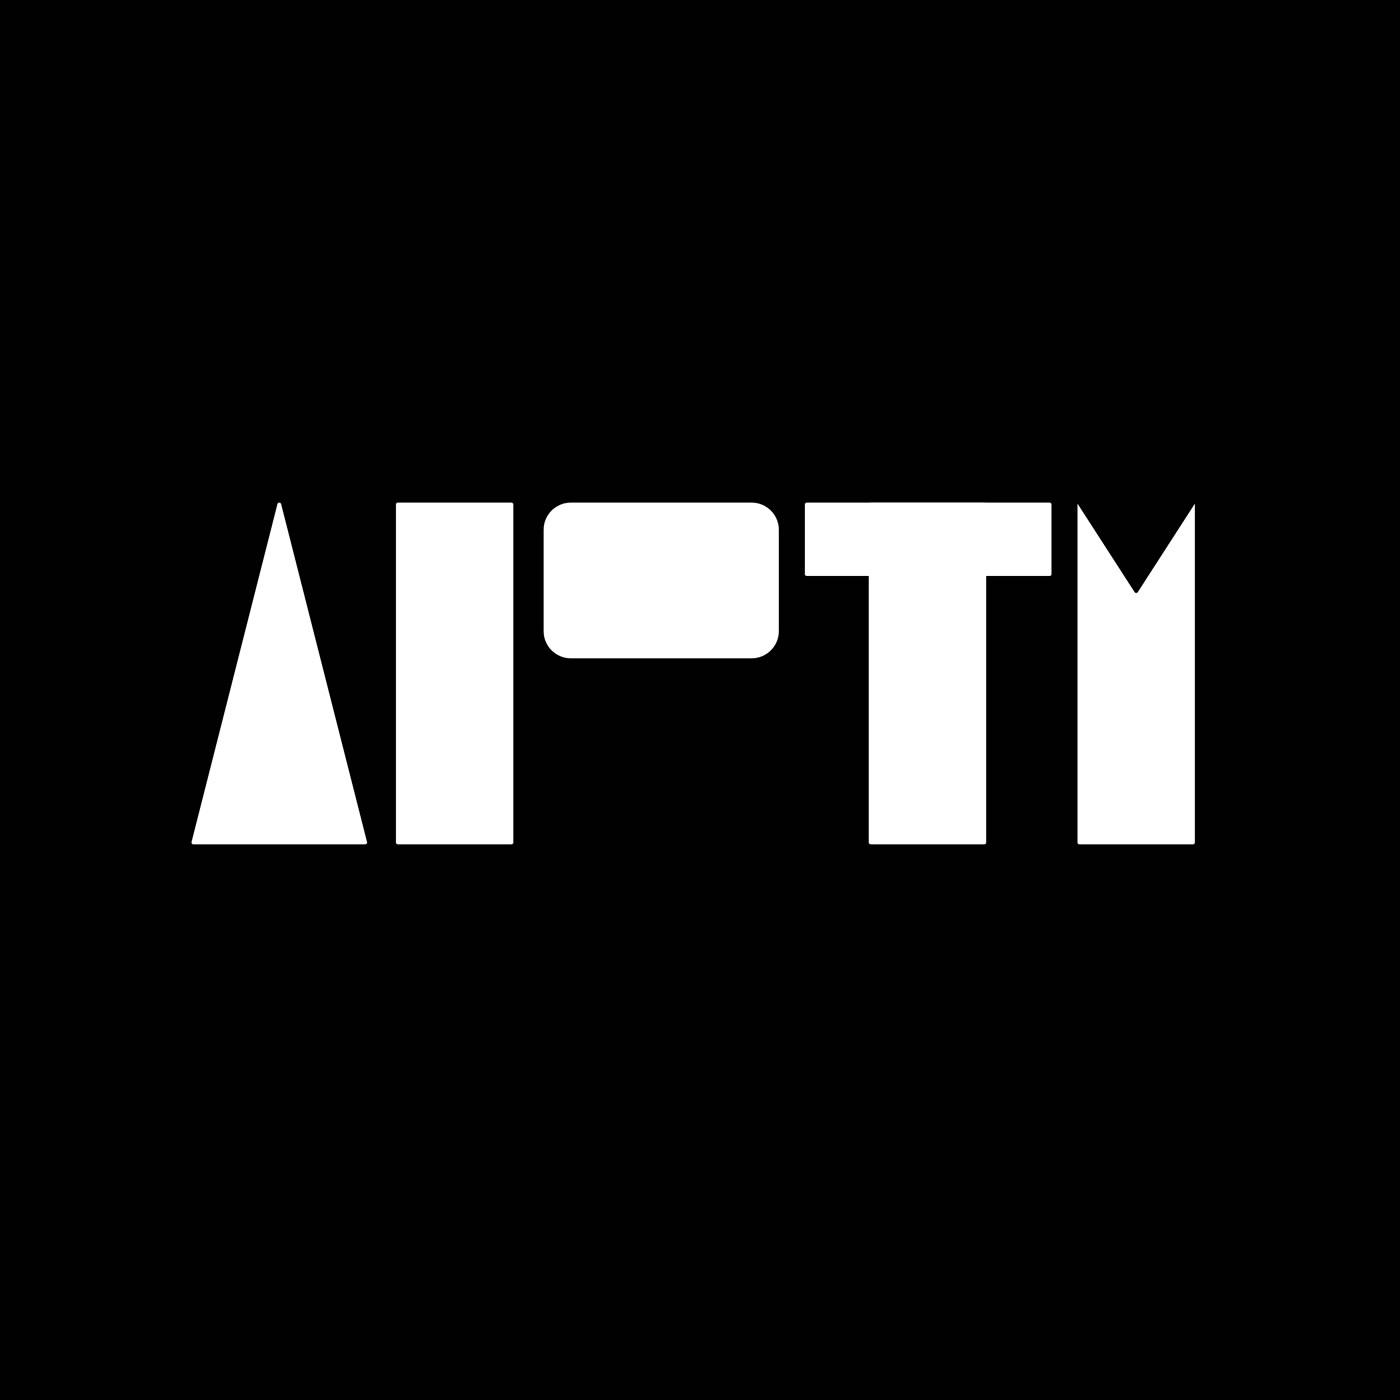 AIOTM - Video Series #6